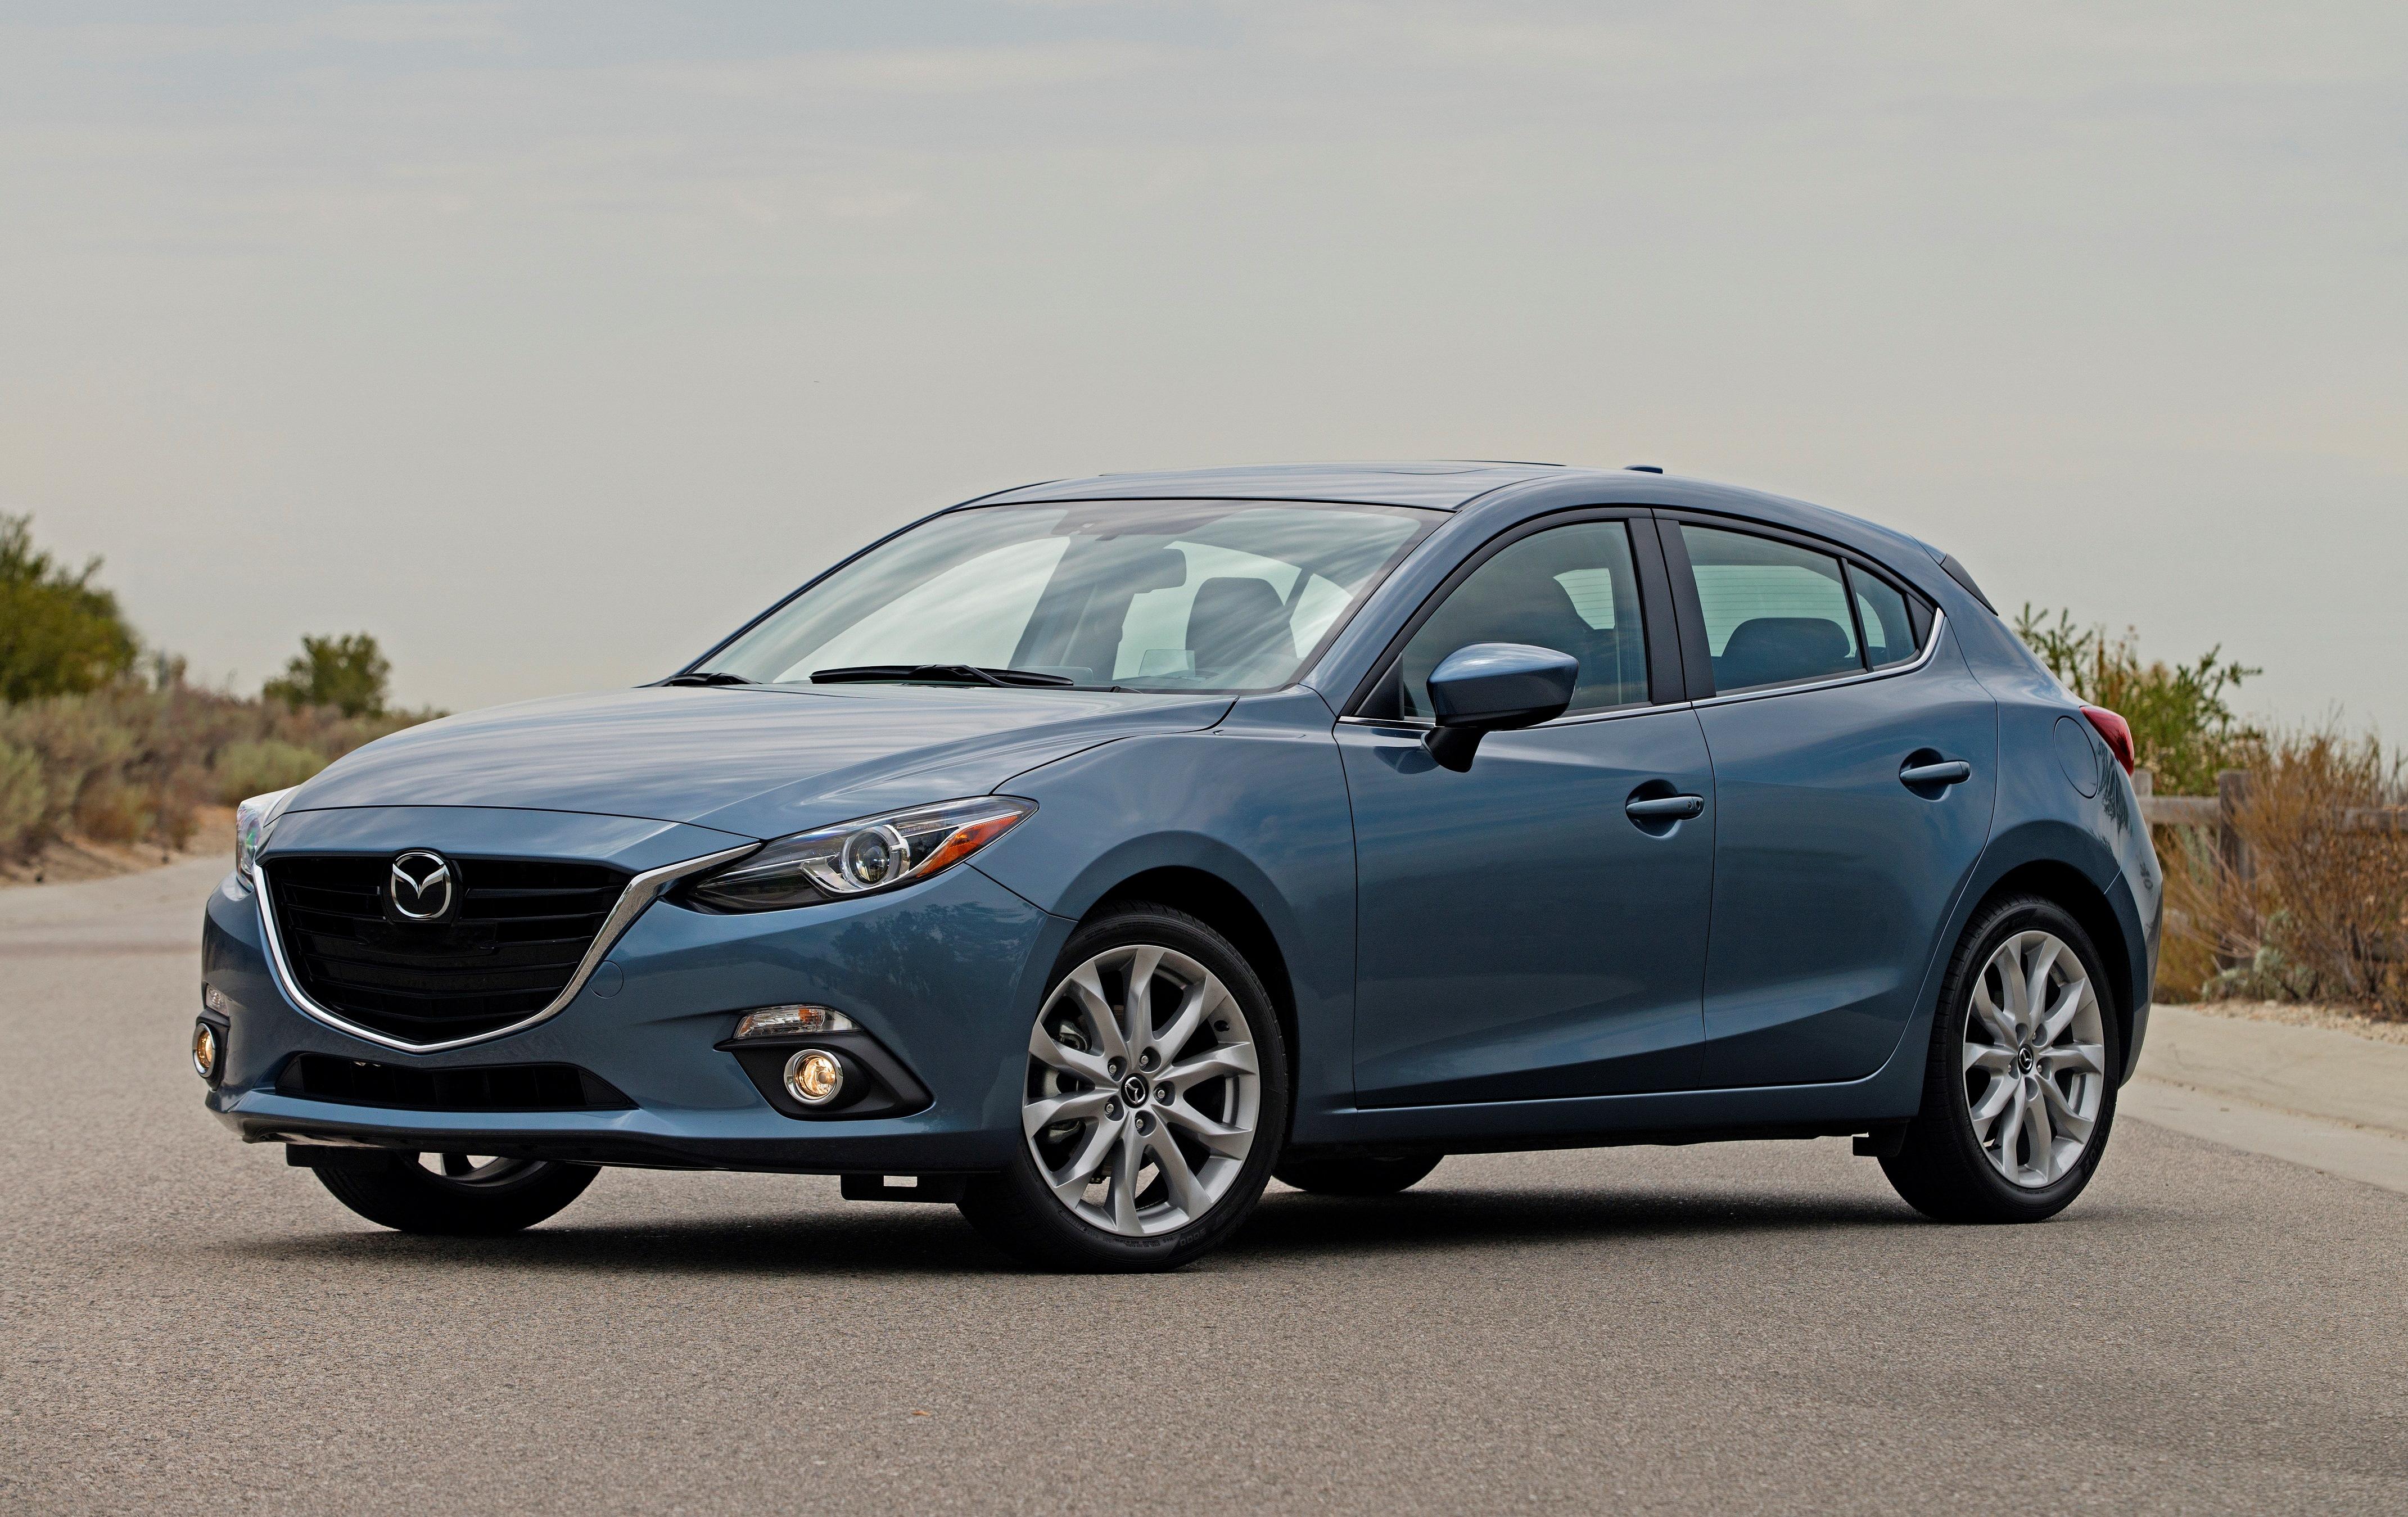 HQ 2014 Mazda 3 Wallpapers | File 3470.45Kb